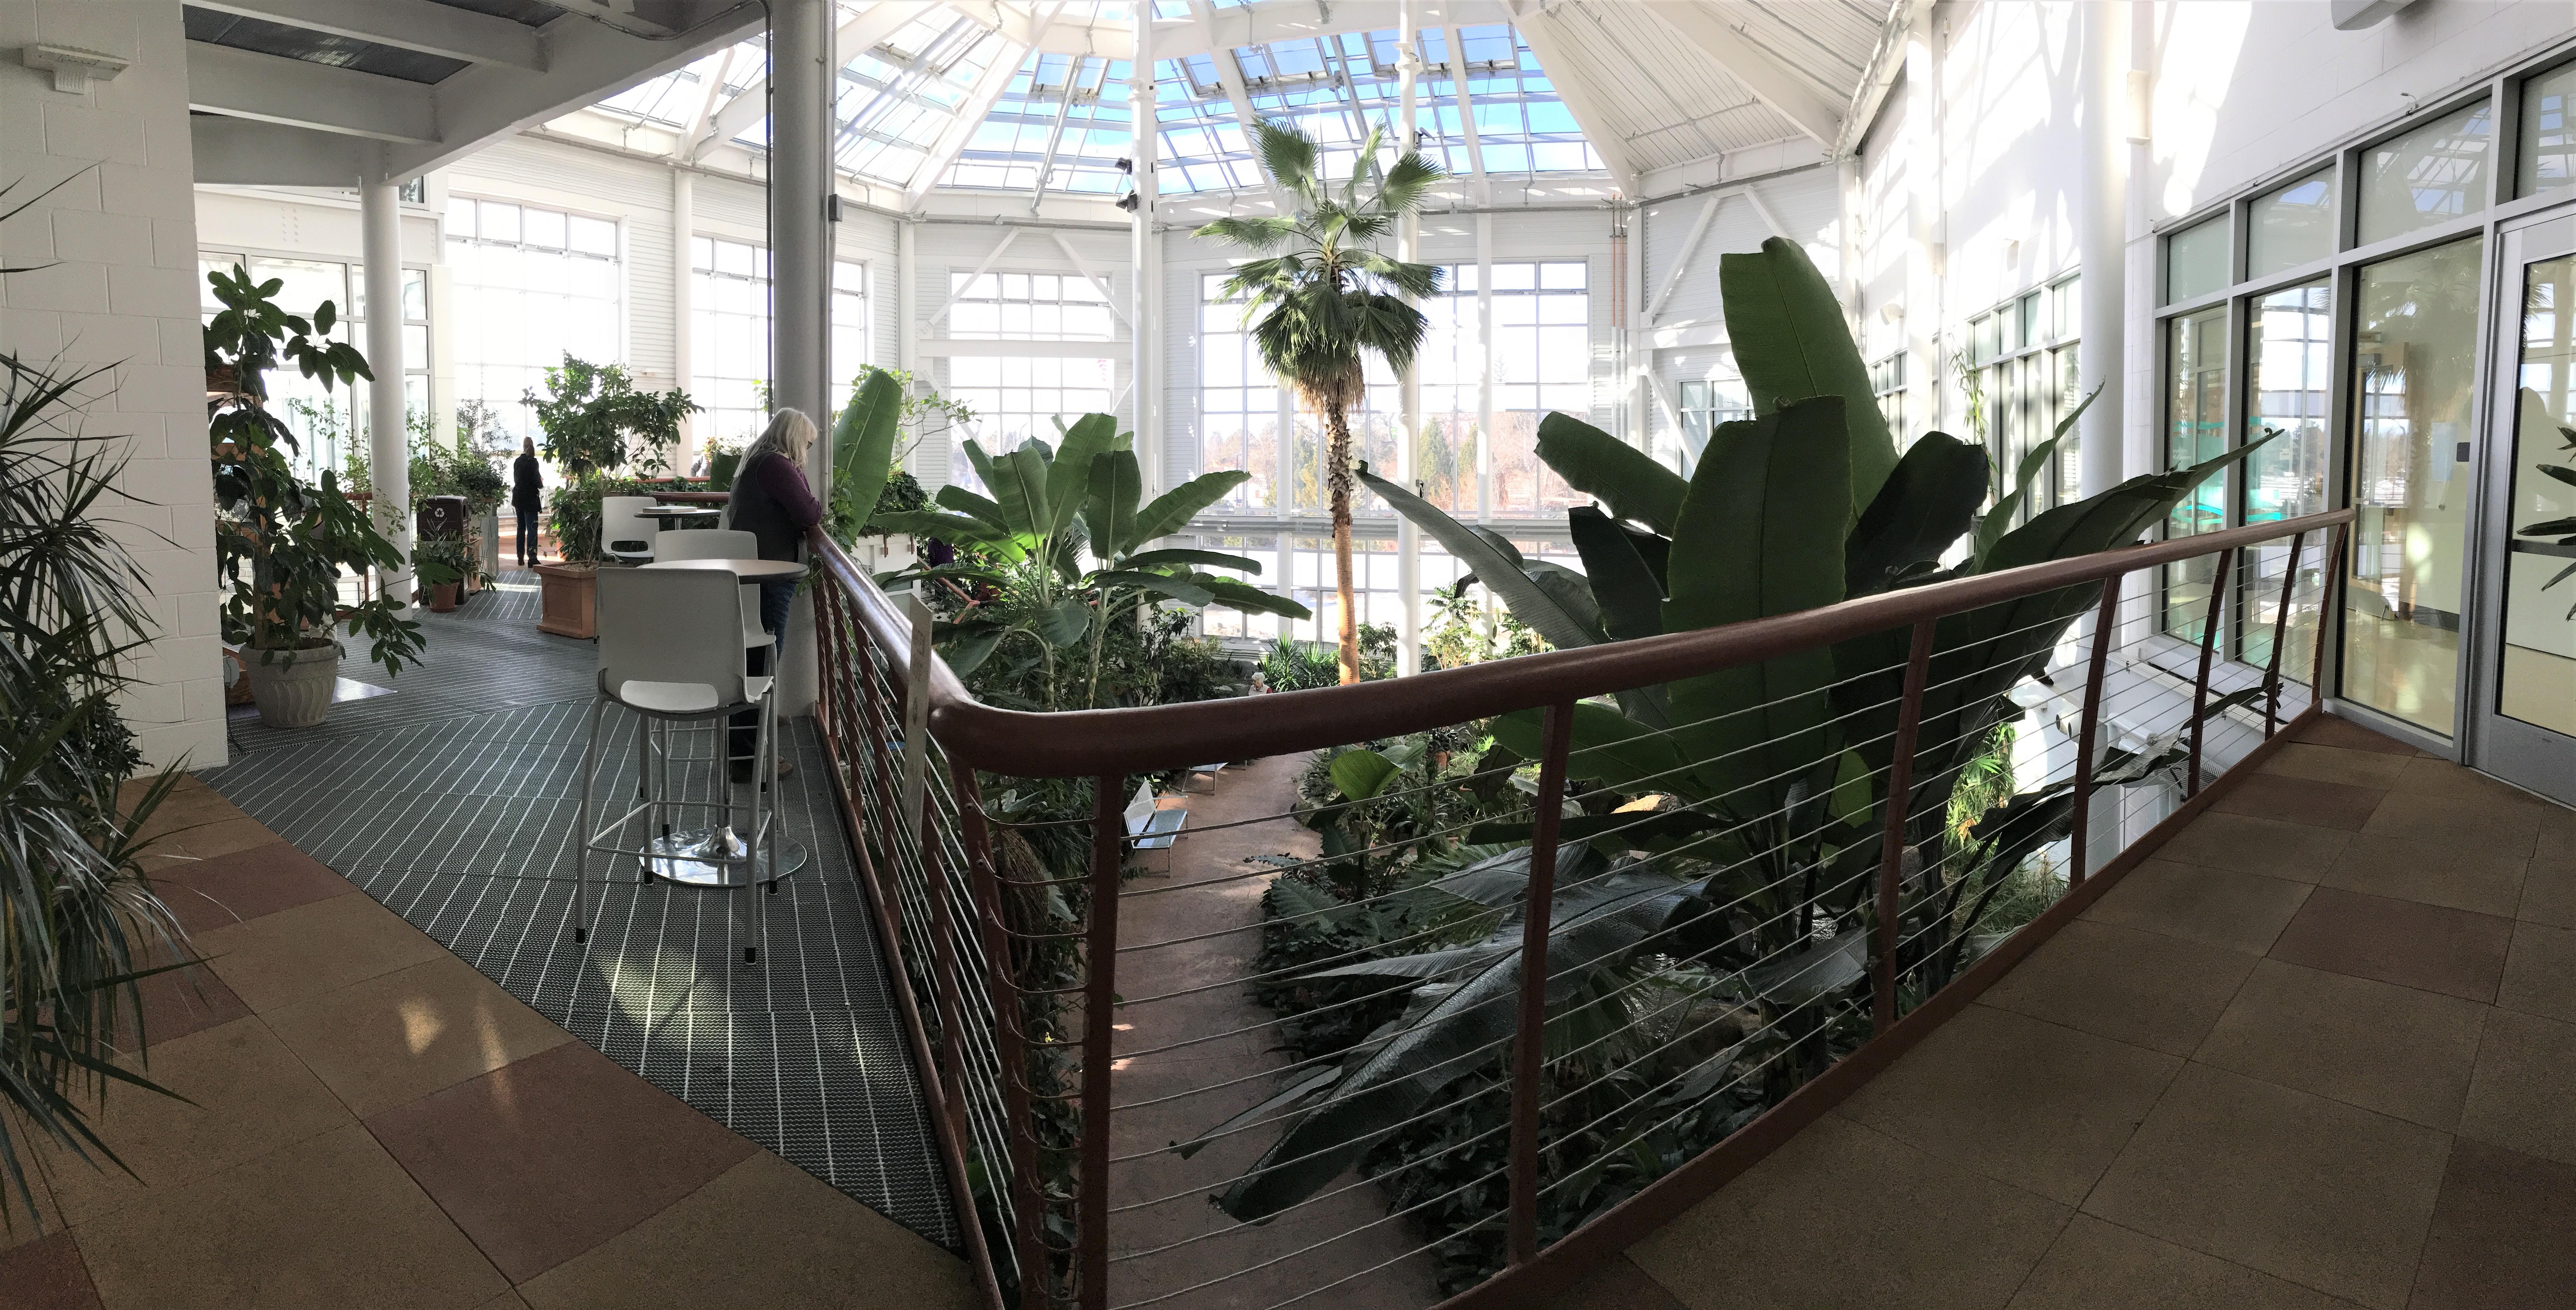 2019-01-26 cbg conservatory 10